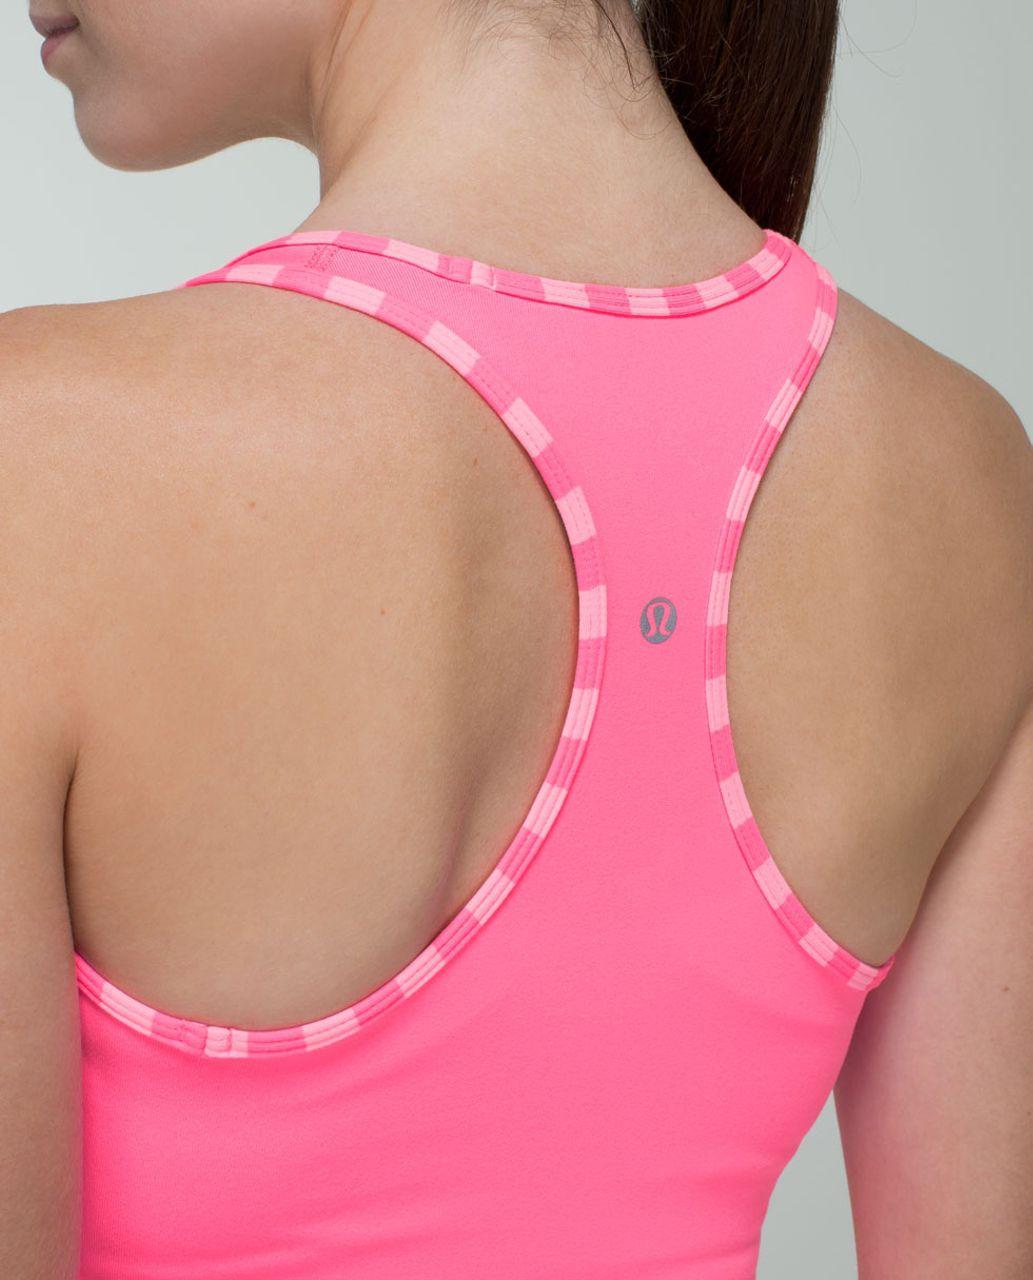 Lululemon Cool Racerback - Zing Pink Light / Apex Stripe Zing Pink Light